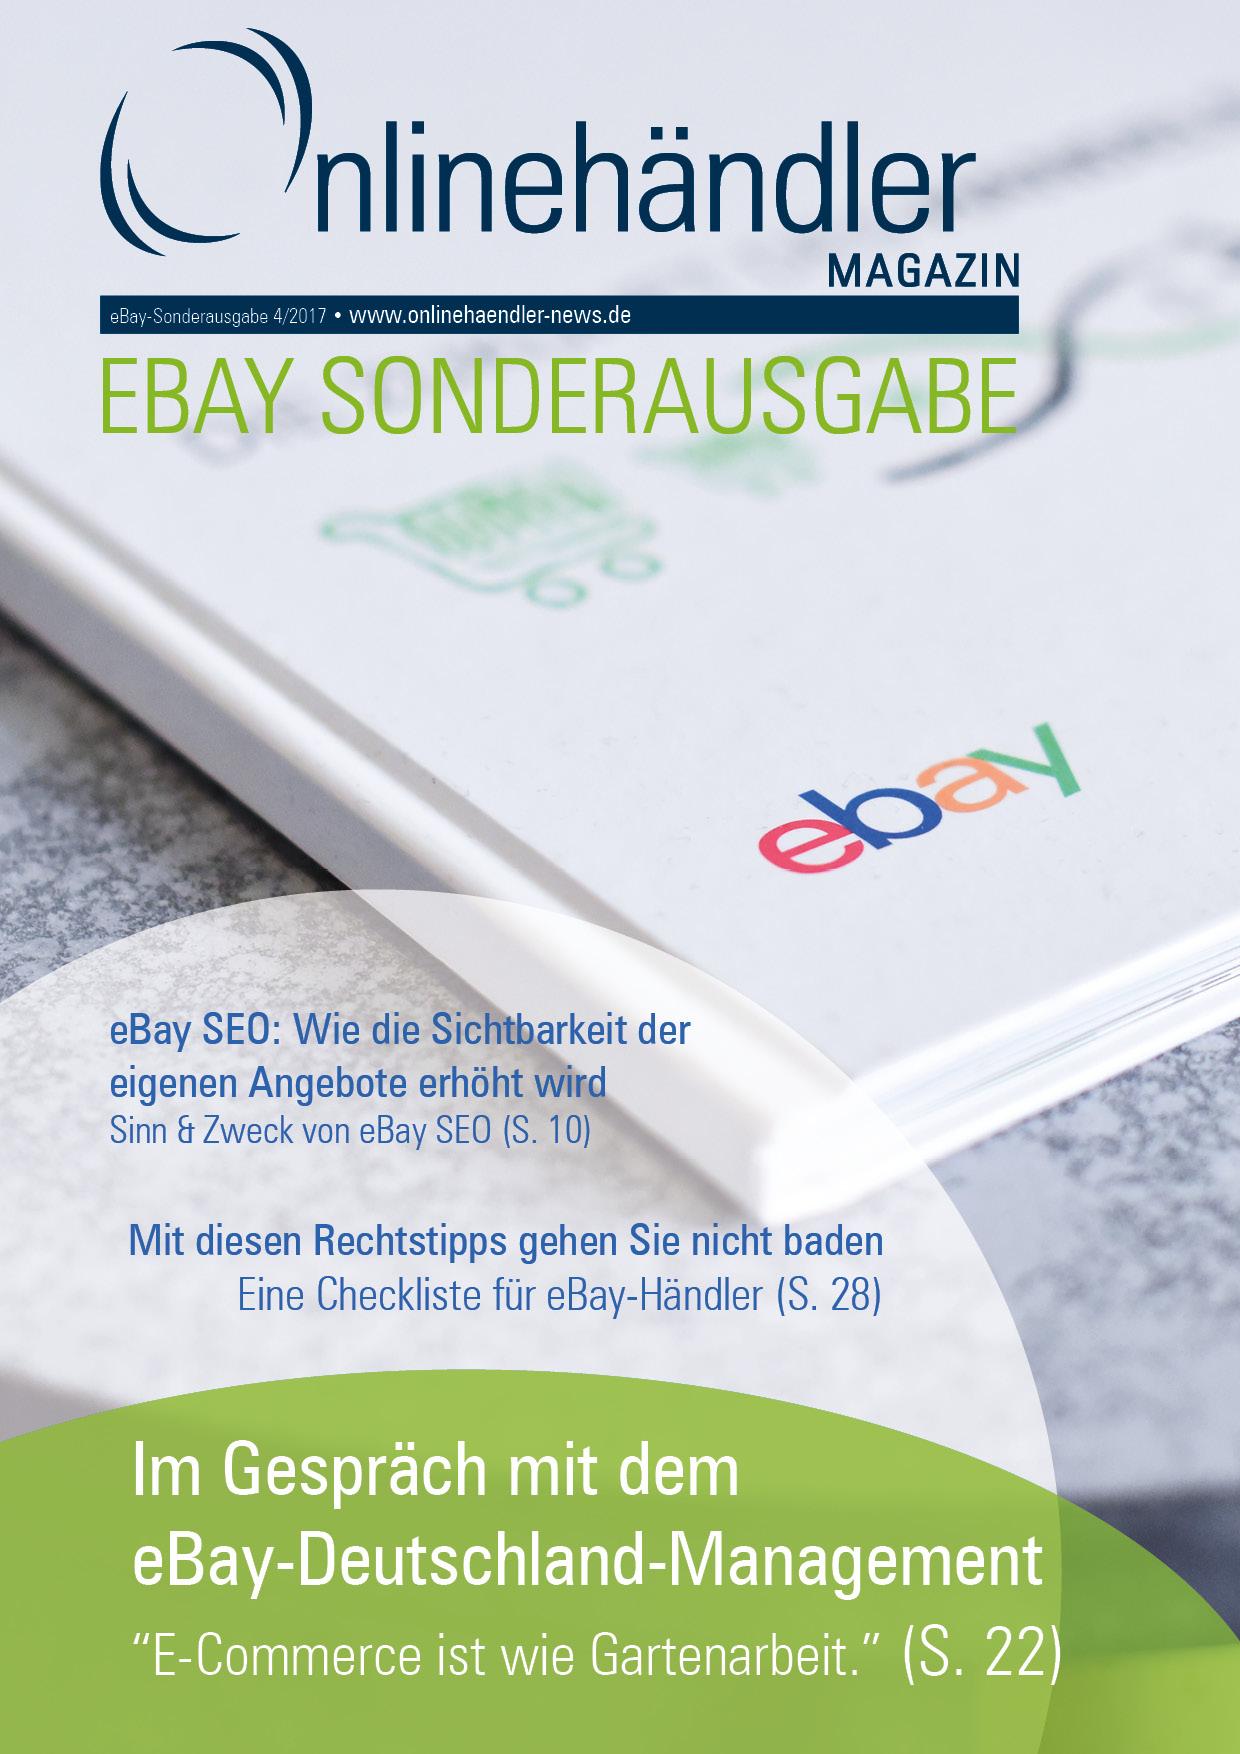 eBay Sonderausgabe